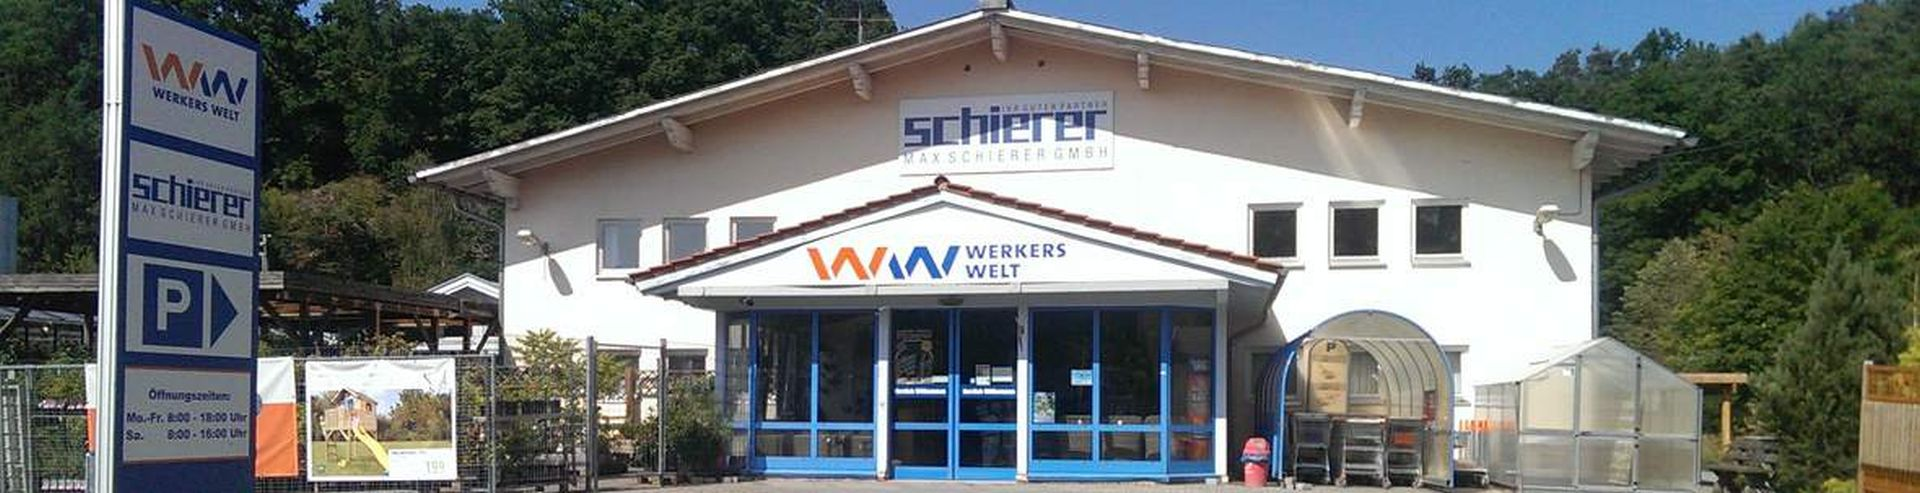 Werkers Welt Viechtach